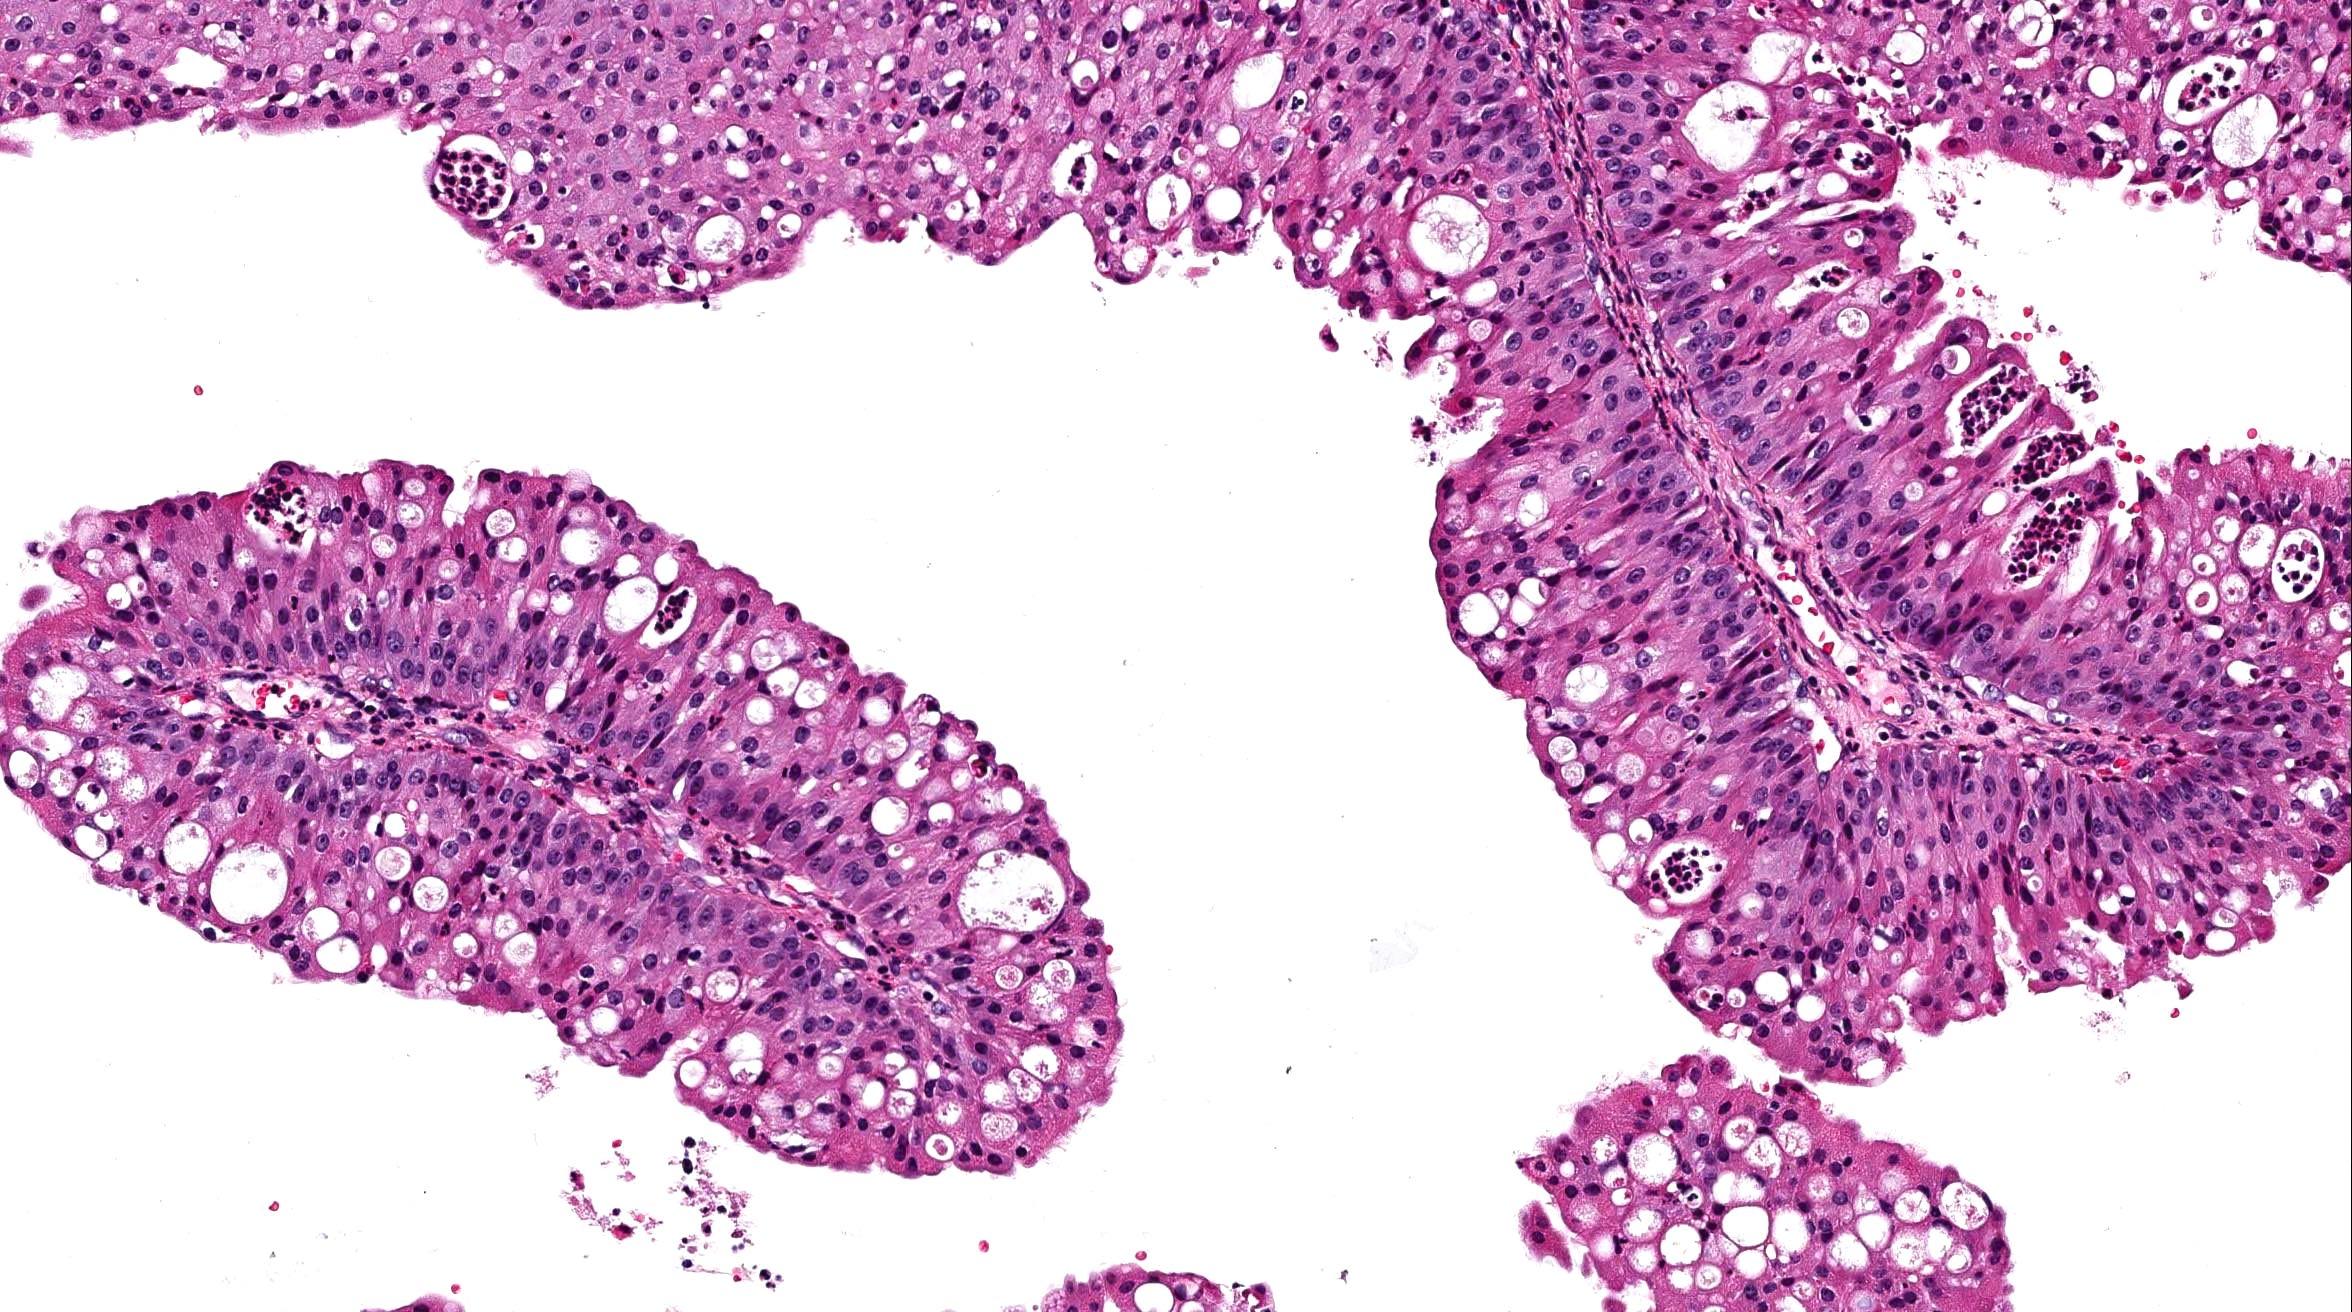 schneiderian papilloma and hpv parazitii margineanu